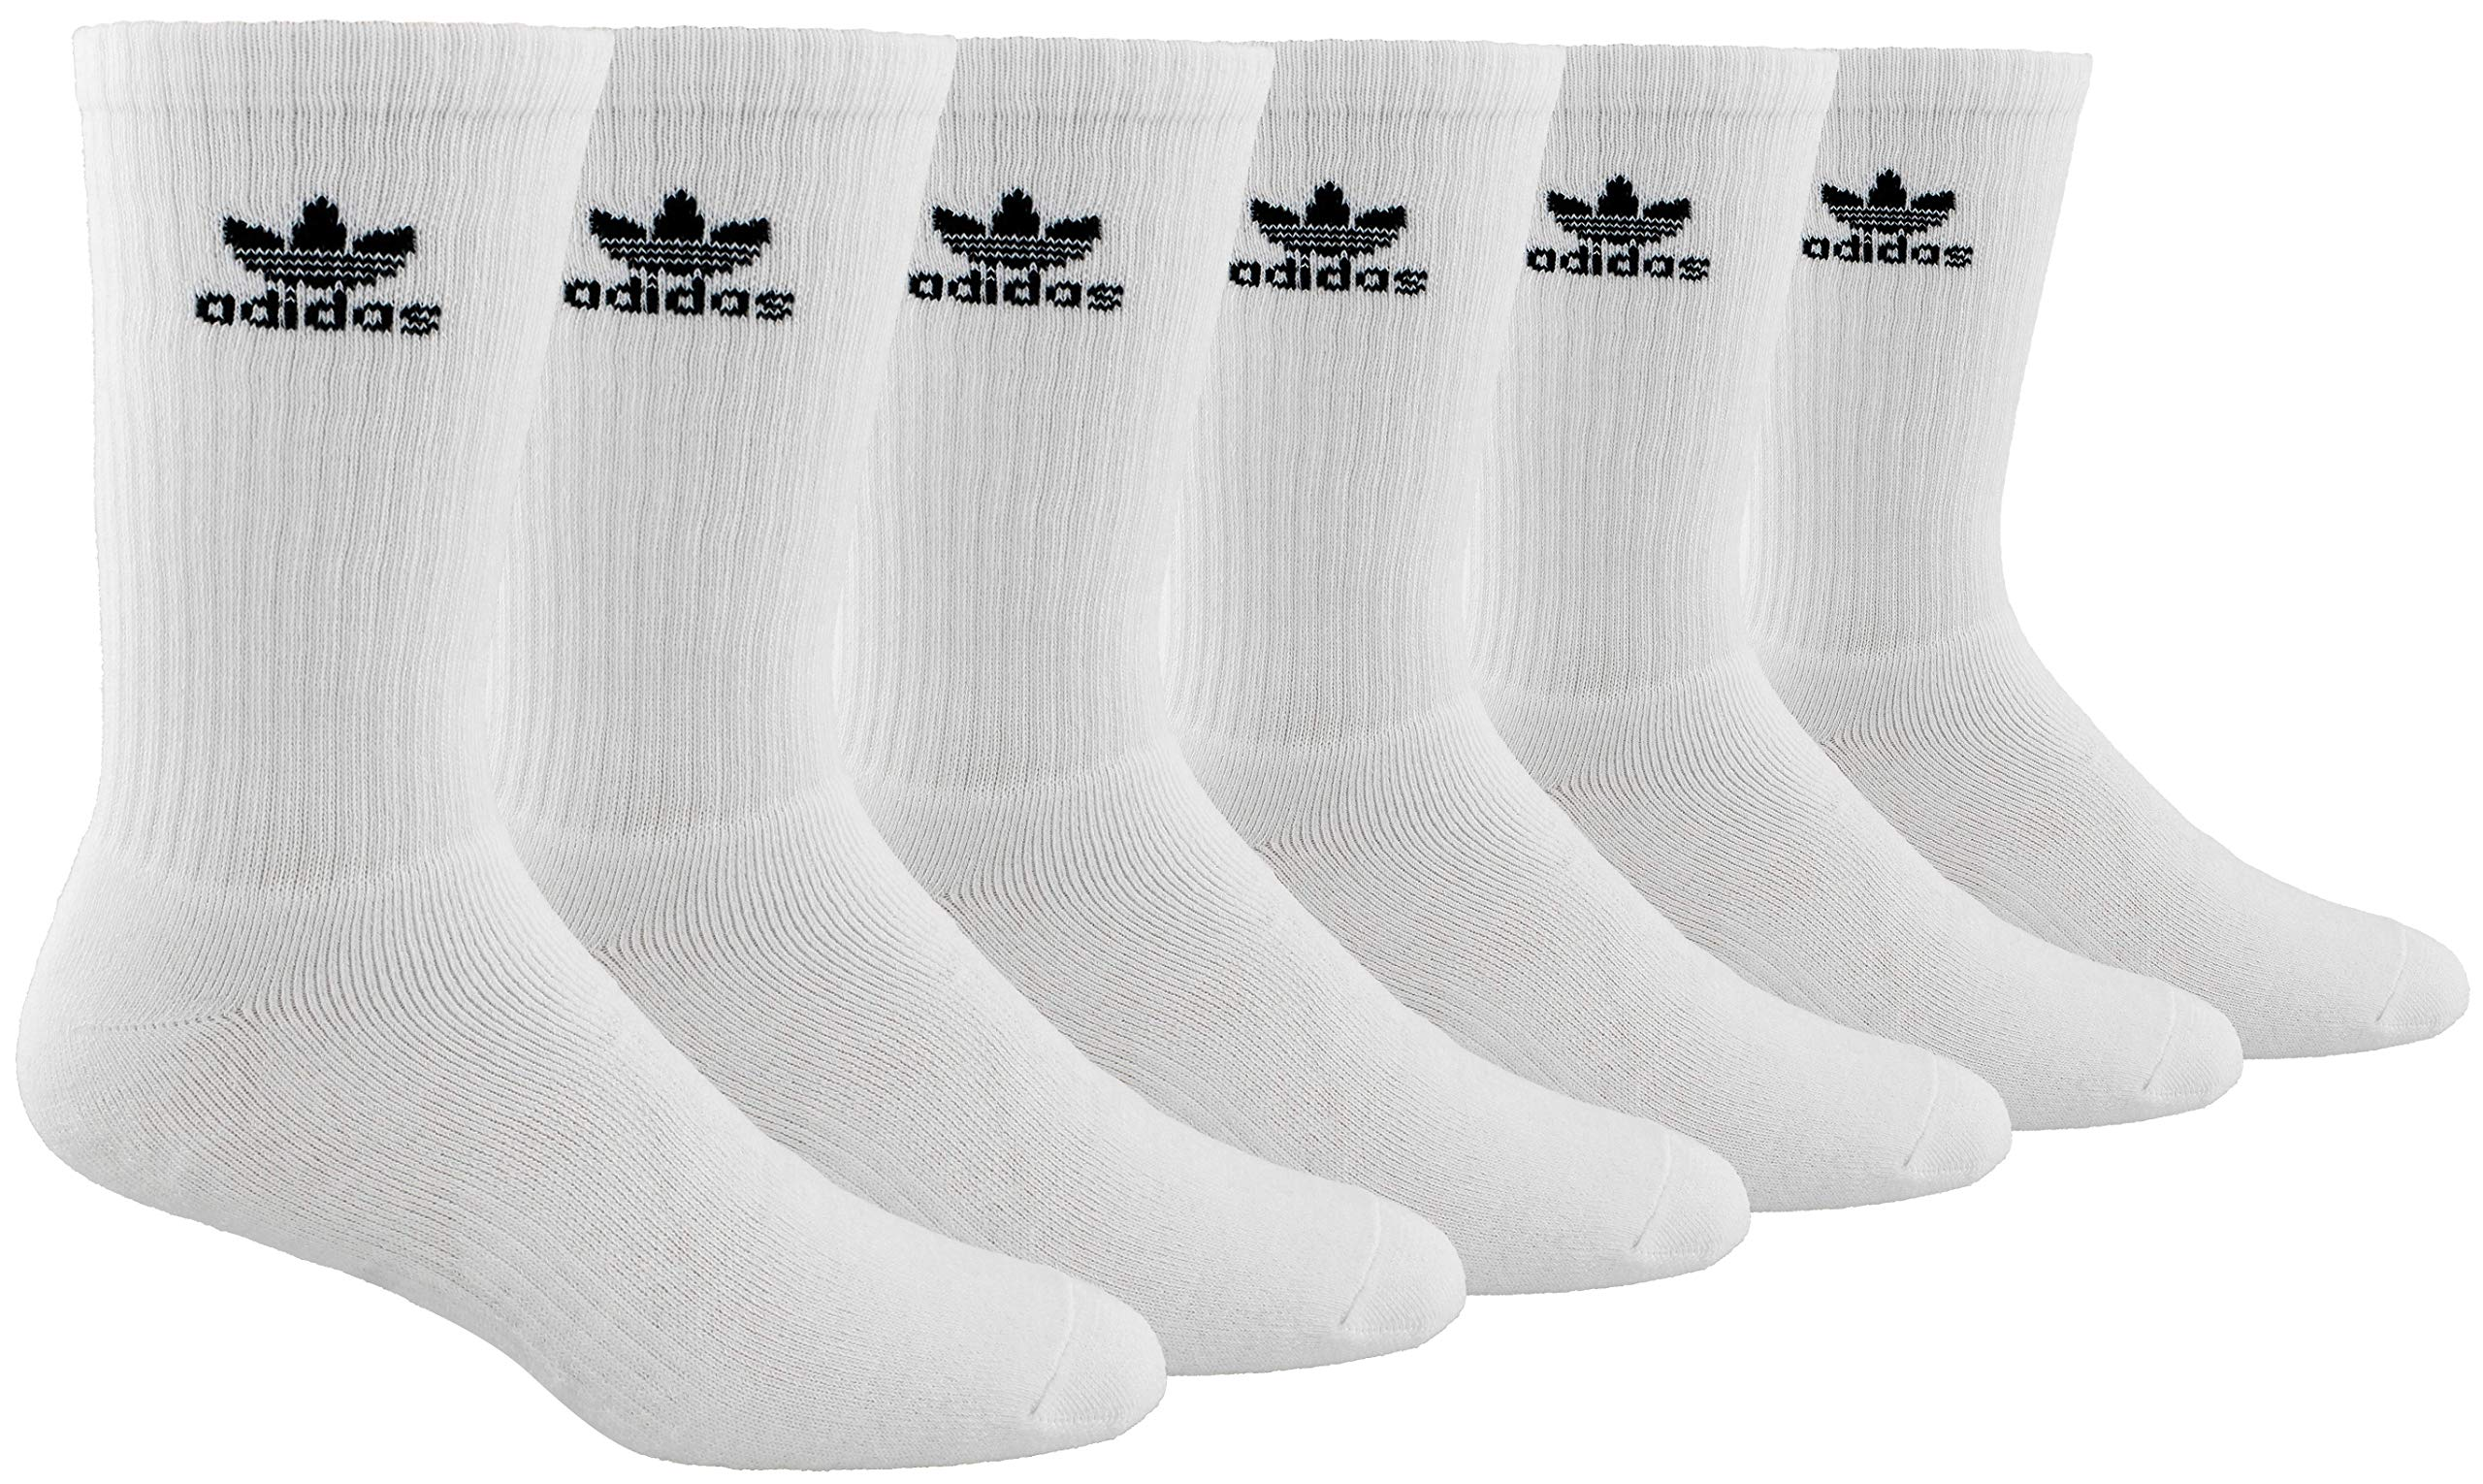 adidas Men's Athletic Cushioned Crew Socks (6-Pair), White/Black, Large, (Shoe Size 6-12) by adidas